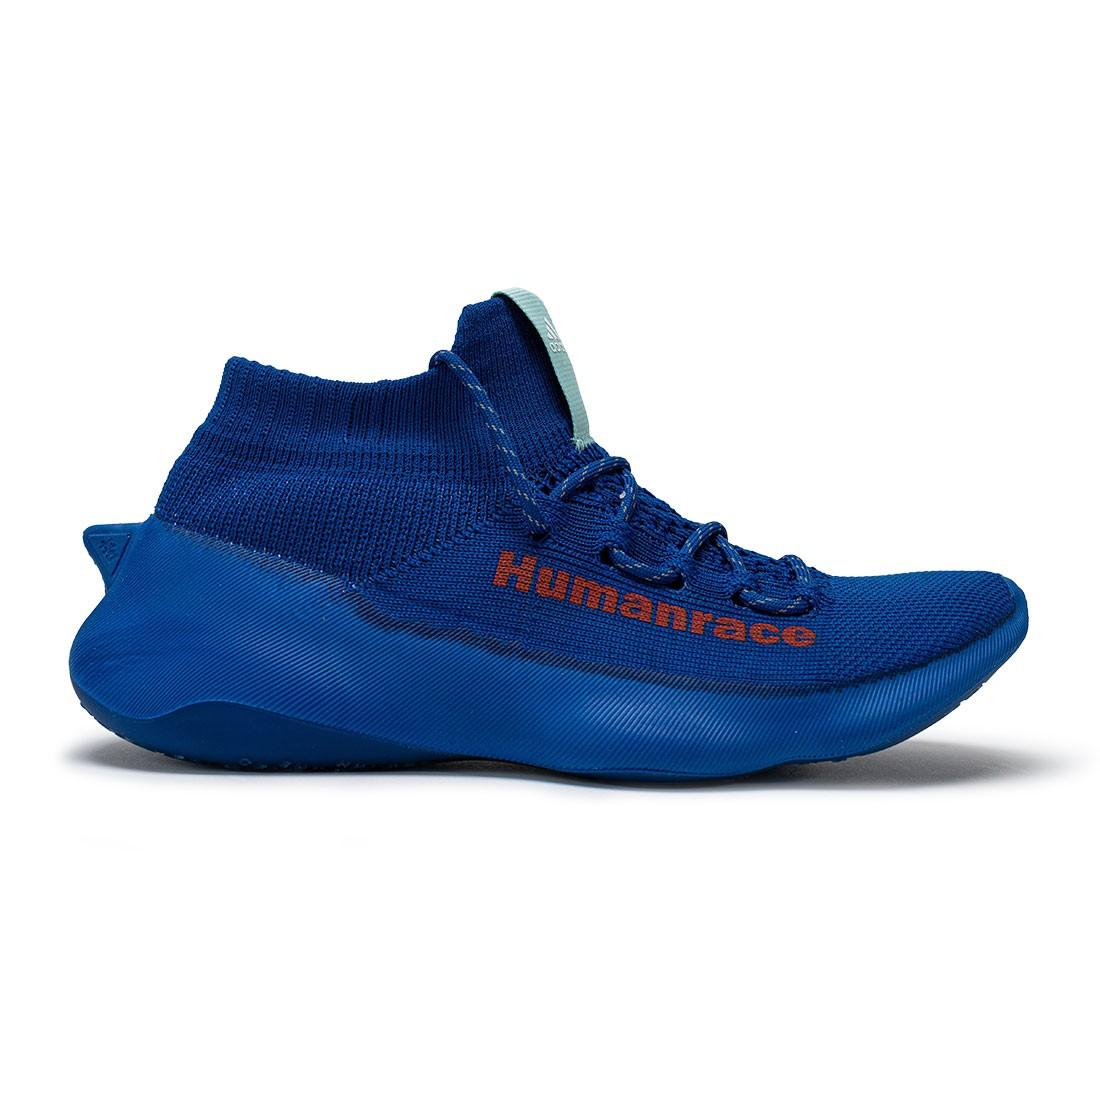 Adidas x Pharrell Williams Men HumanRace Sichona (blue / royal blue / easy coral / clear aqua)